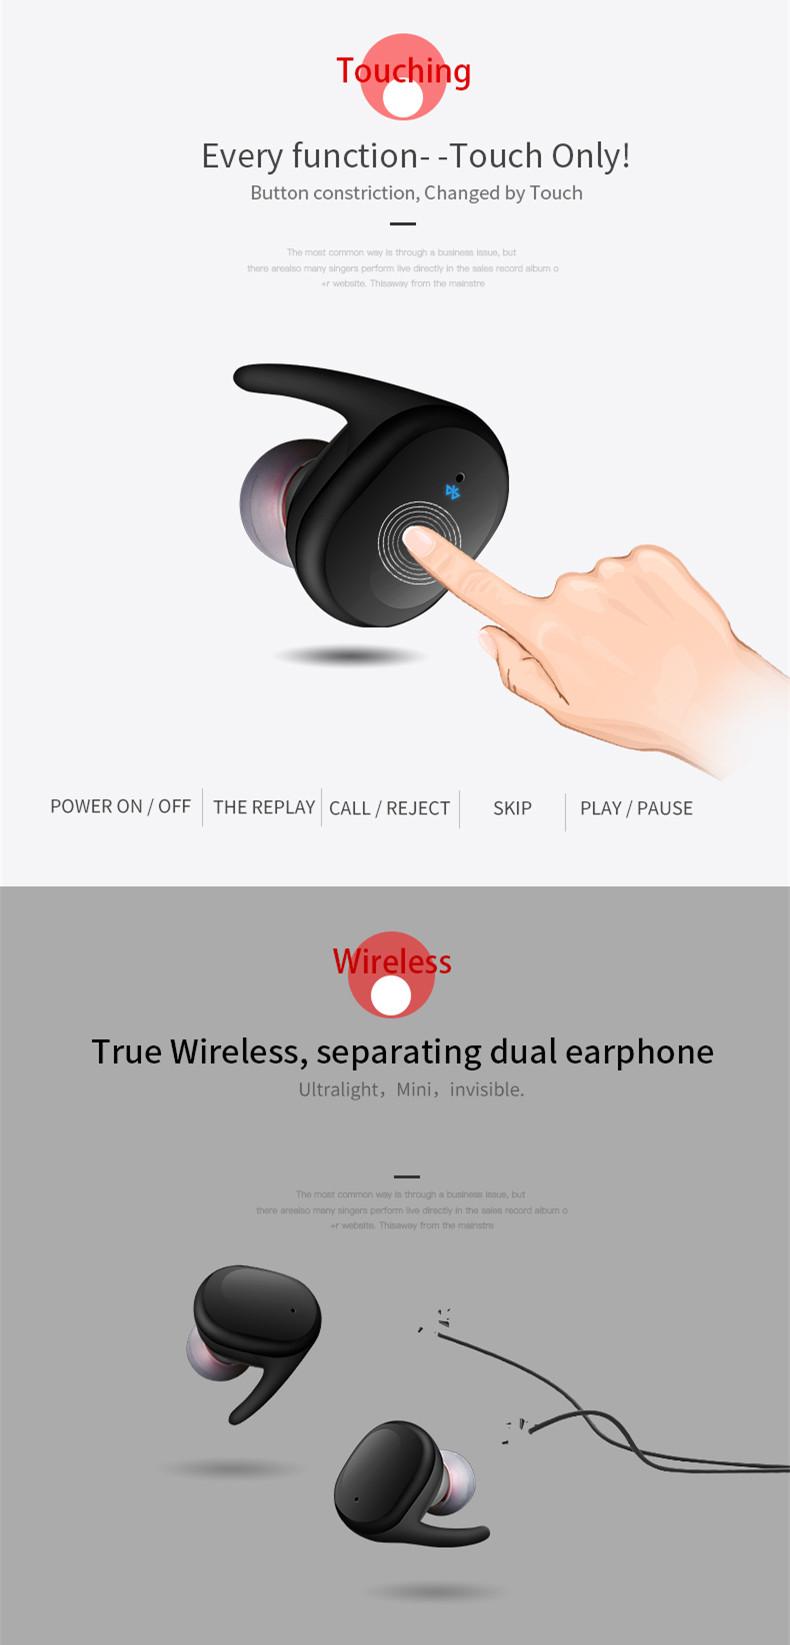 [Truly Wireless] Sport Stereo Stealth Waterproof Wireless Bluetooth Dual Earphones Headphones